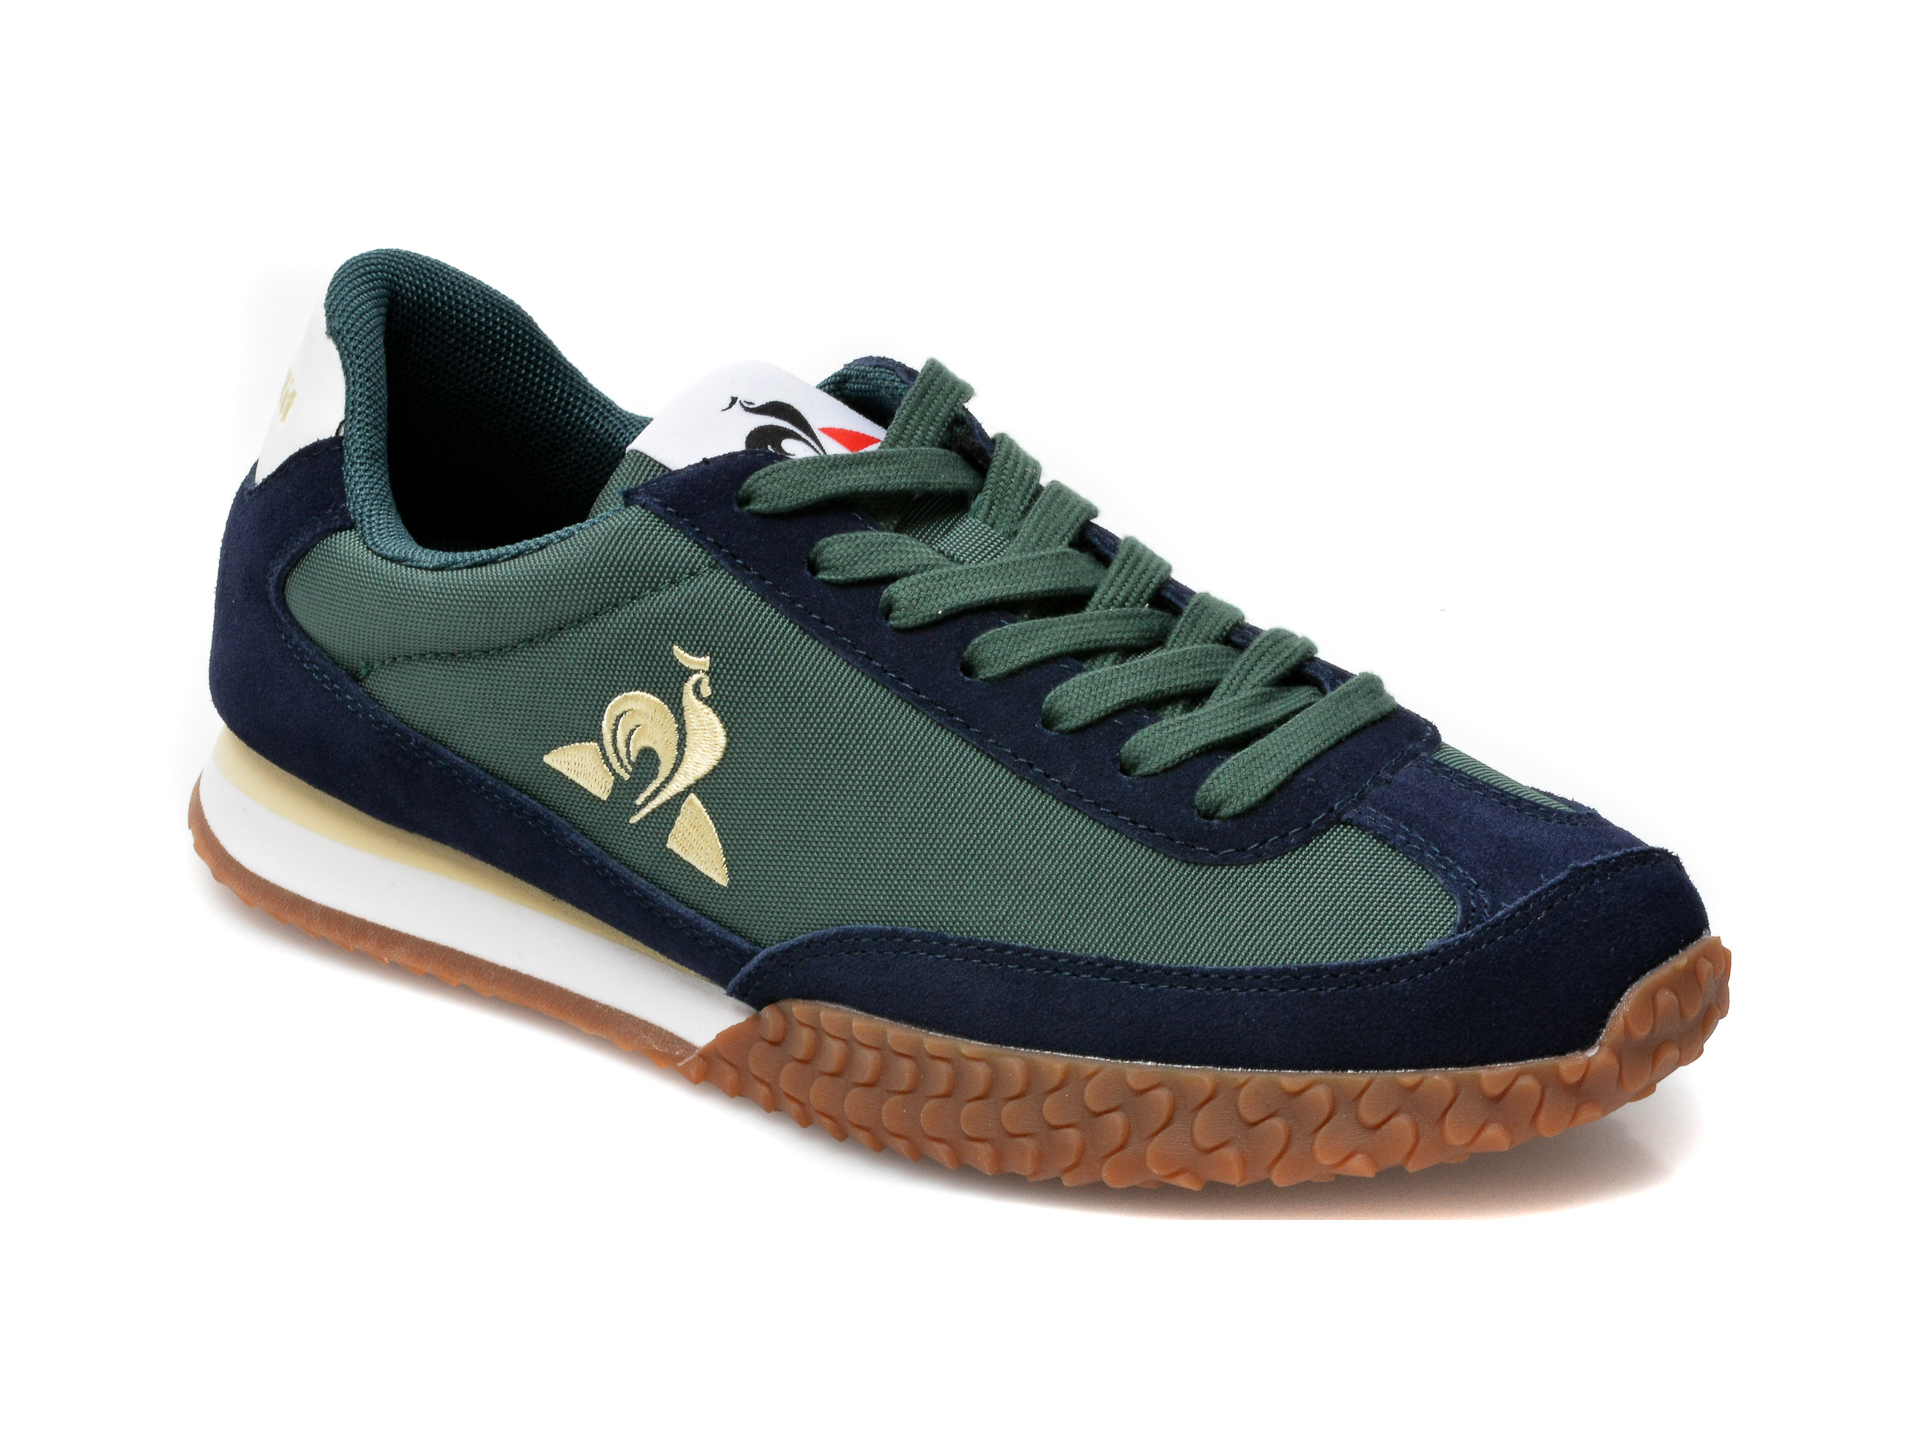 Pantofi sport LE COQ SPORTIF verzi, Veloce, din material textil si piele naturala imagine otter.ro 2021